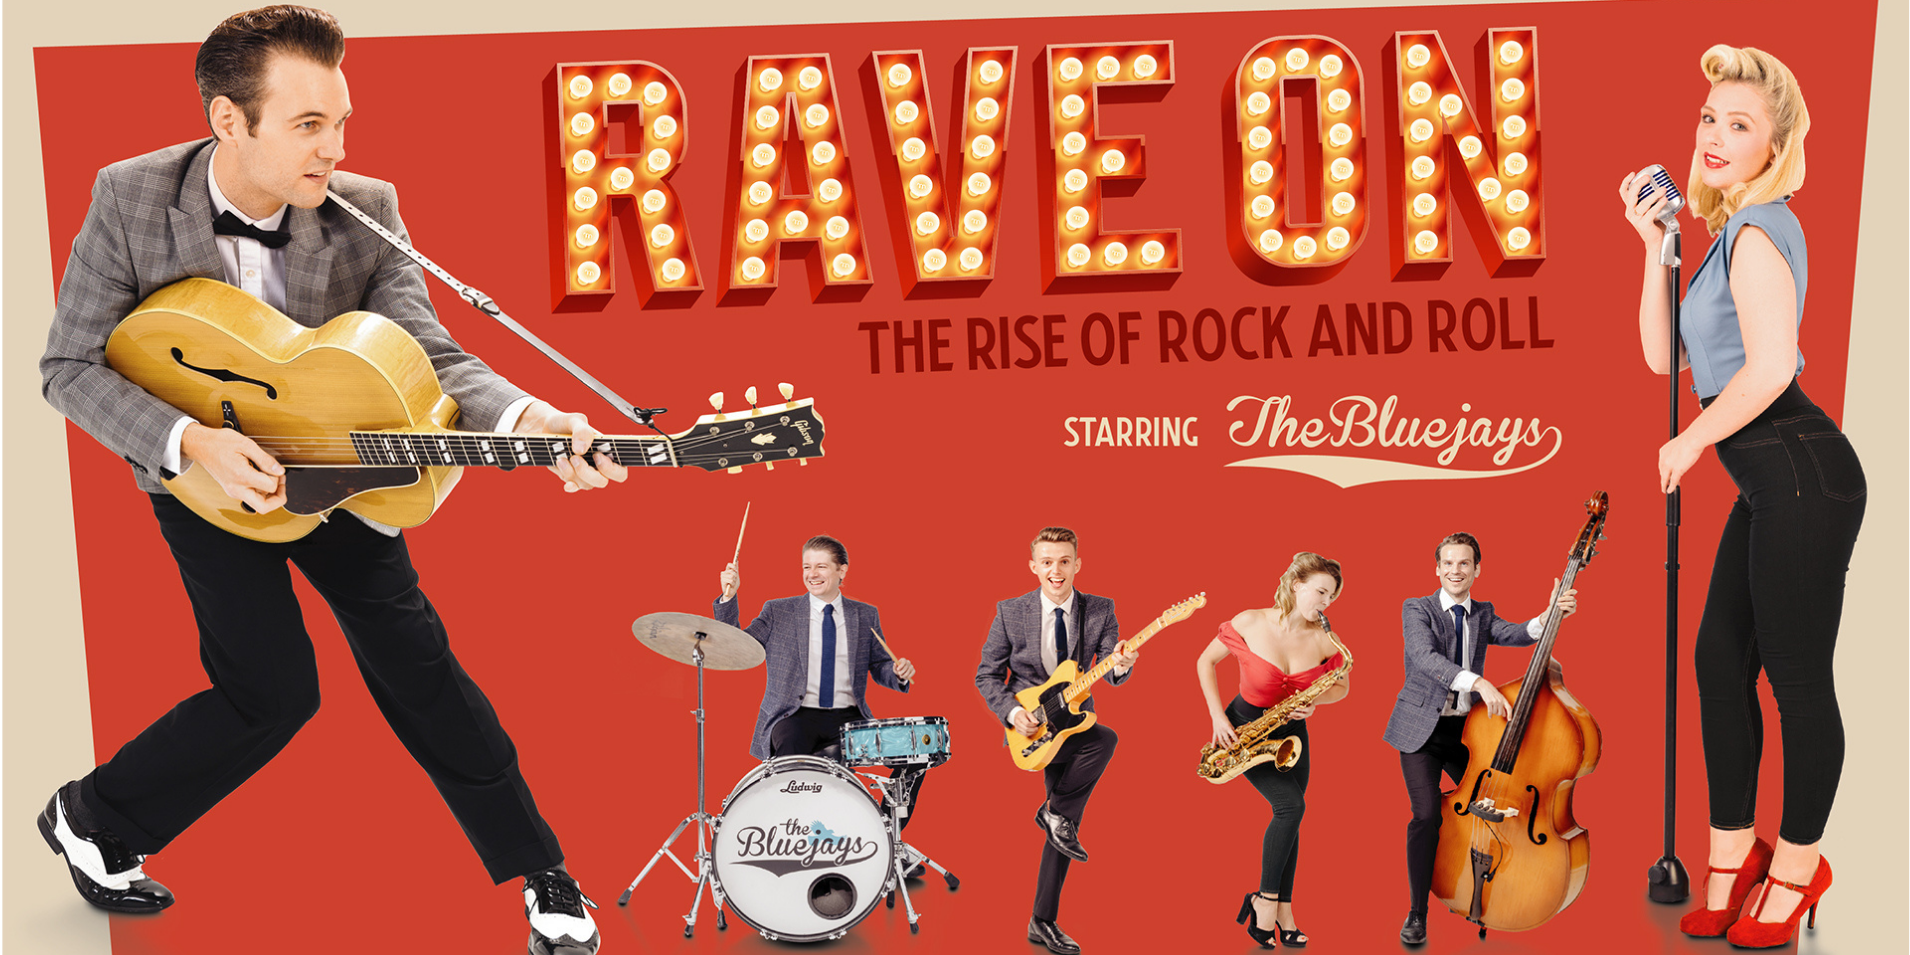 The Bluejays: Rave On